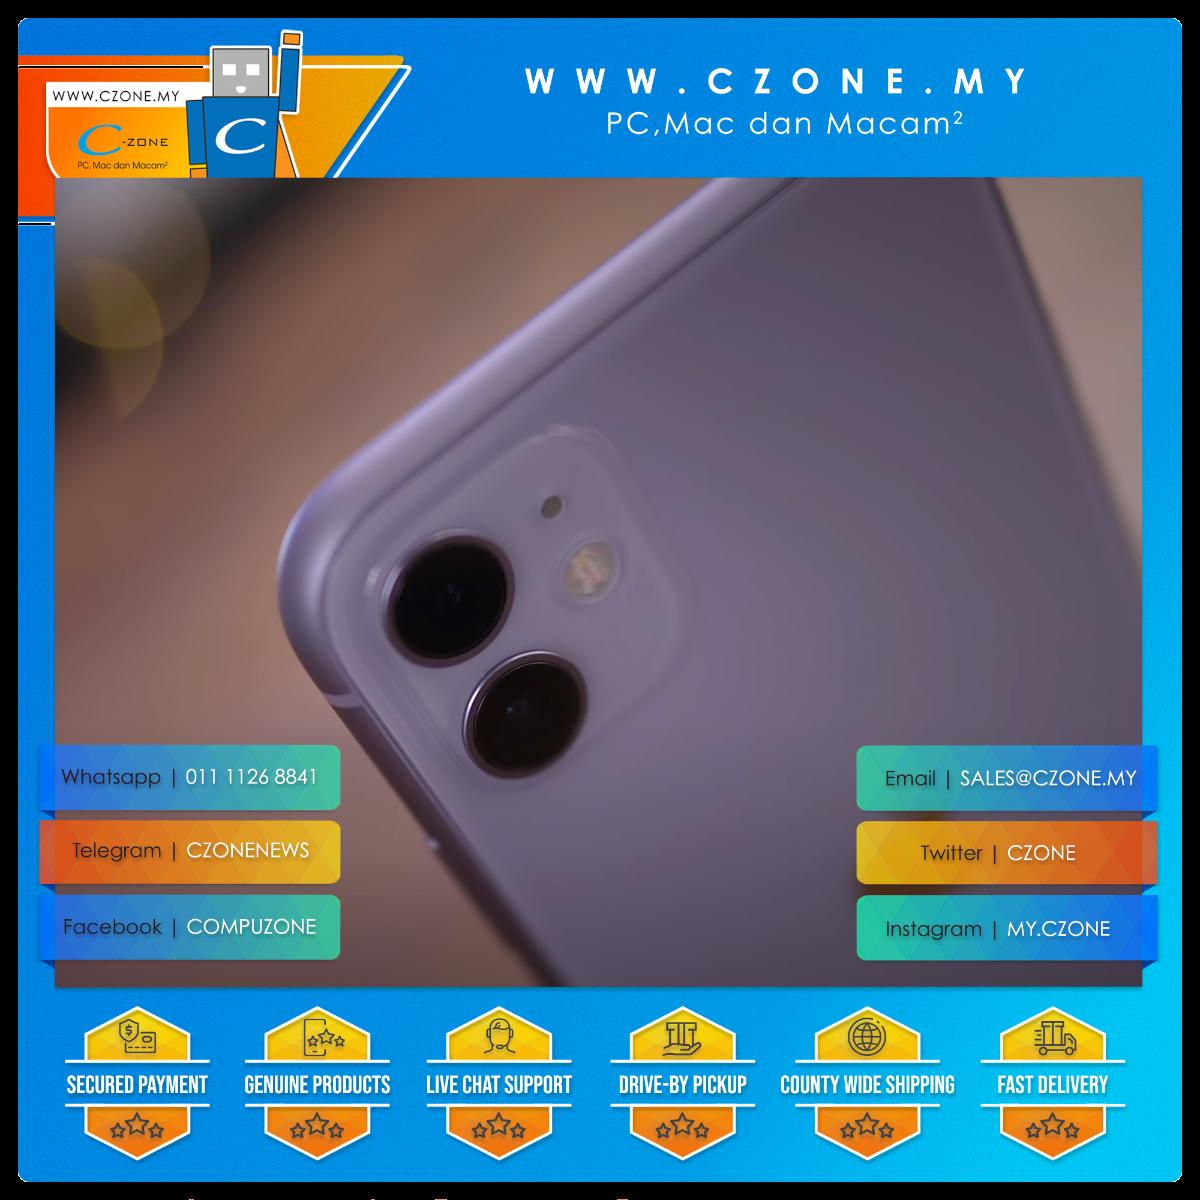 https://czone.my/czone/apple-iphone-11-late-2020.html